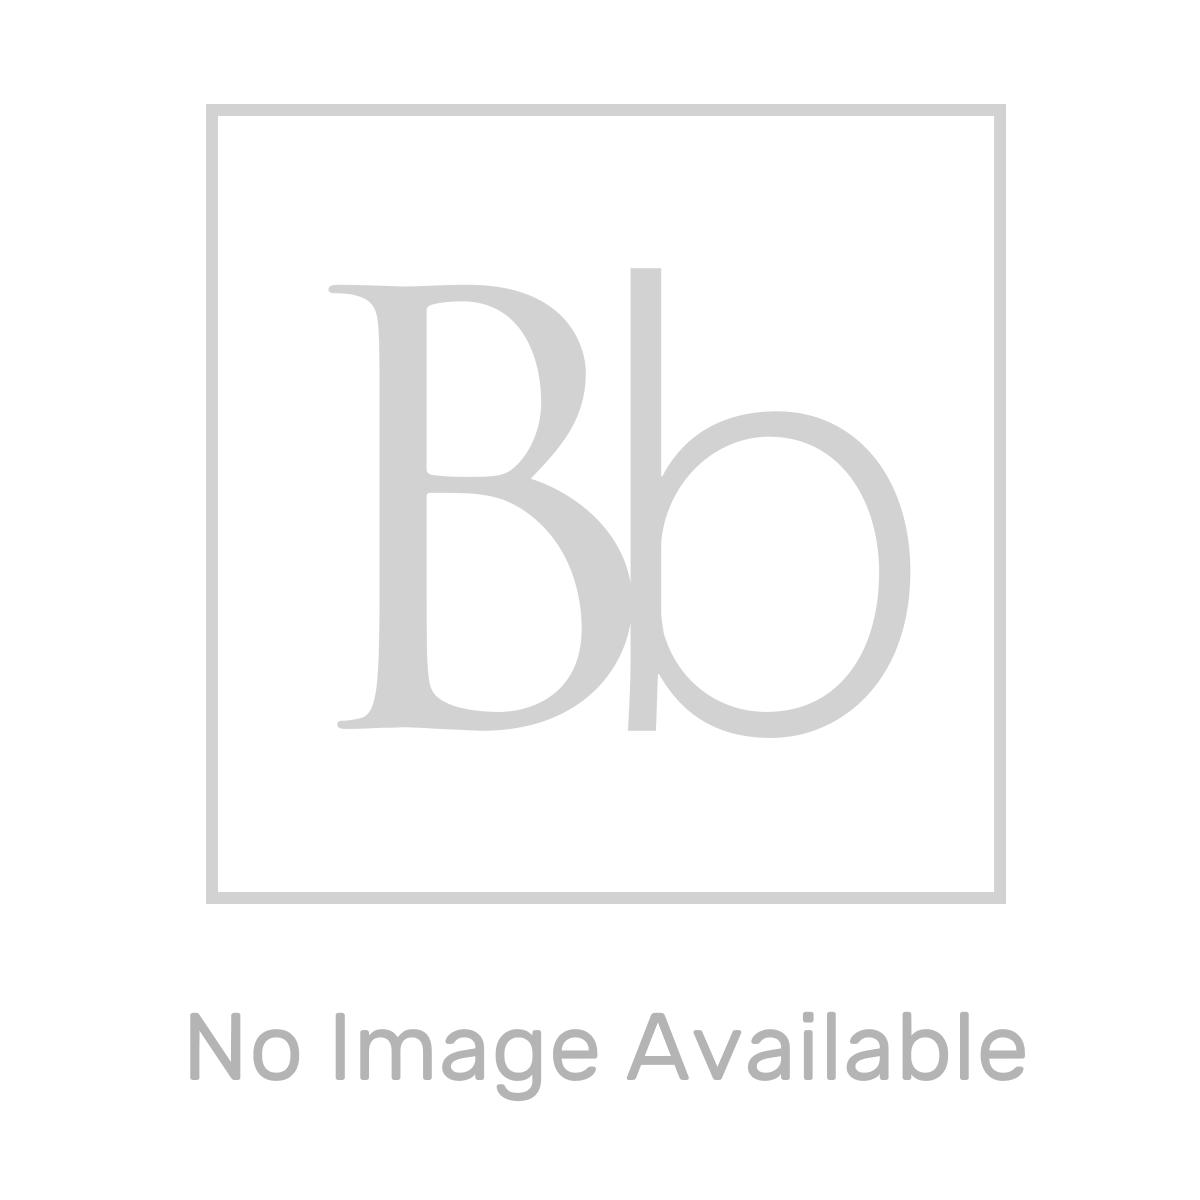 RAK Exposed Automatic Urinal Cistern 9.0L